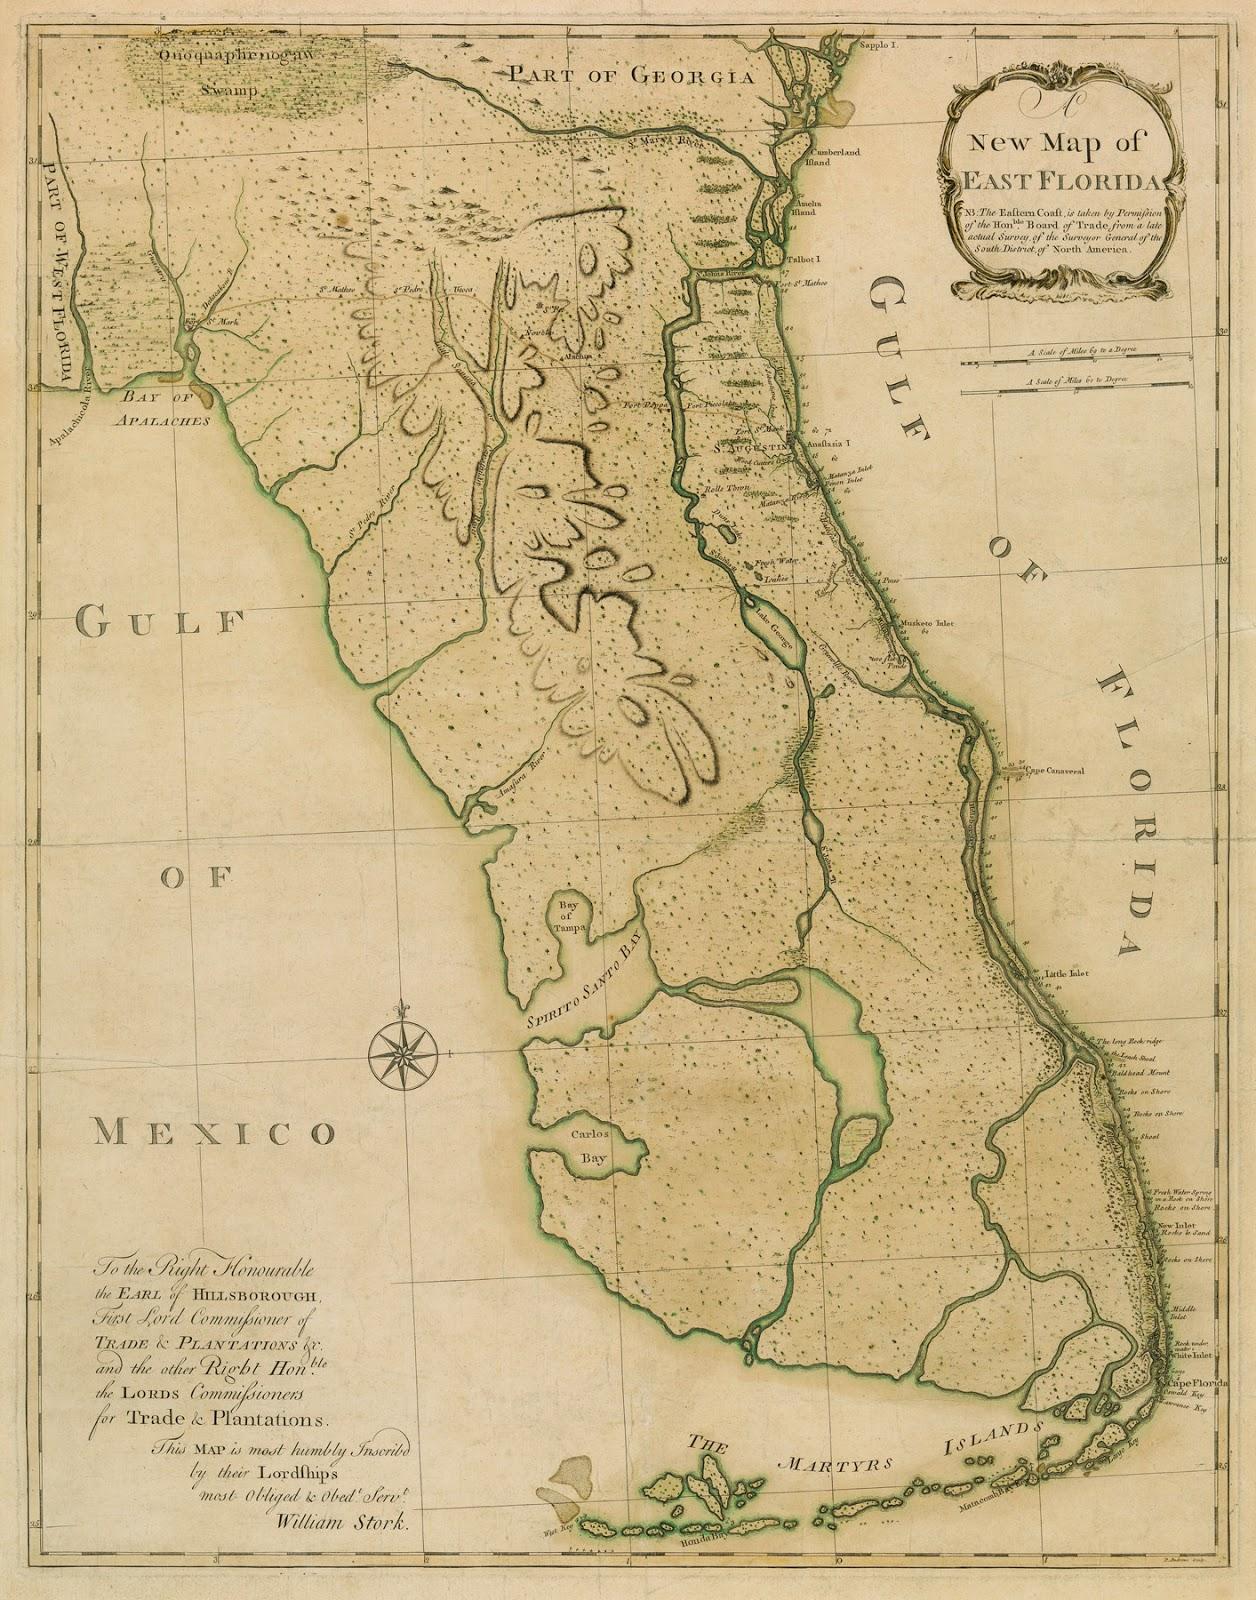 Tampa Bay History Center: Artifact Spotlight: William ... on old st. augustine florida map, orlando florida map, florida map with exit numbers, central fl road map, daytona beach florida map, i 95 sc map, florida expressway map, florida schools map, south florida map, florida local map, florida empire map, florida map i-95, i 75 fl map, florida turnpike map, jacksonville florida map, florida route map, florida general map, florida map mileage, florida map location of dunes, florida oregon map,